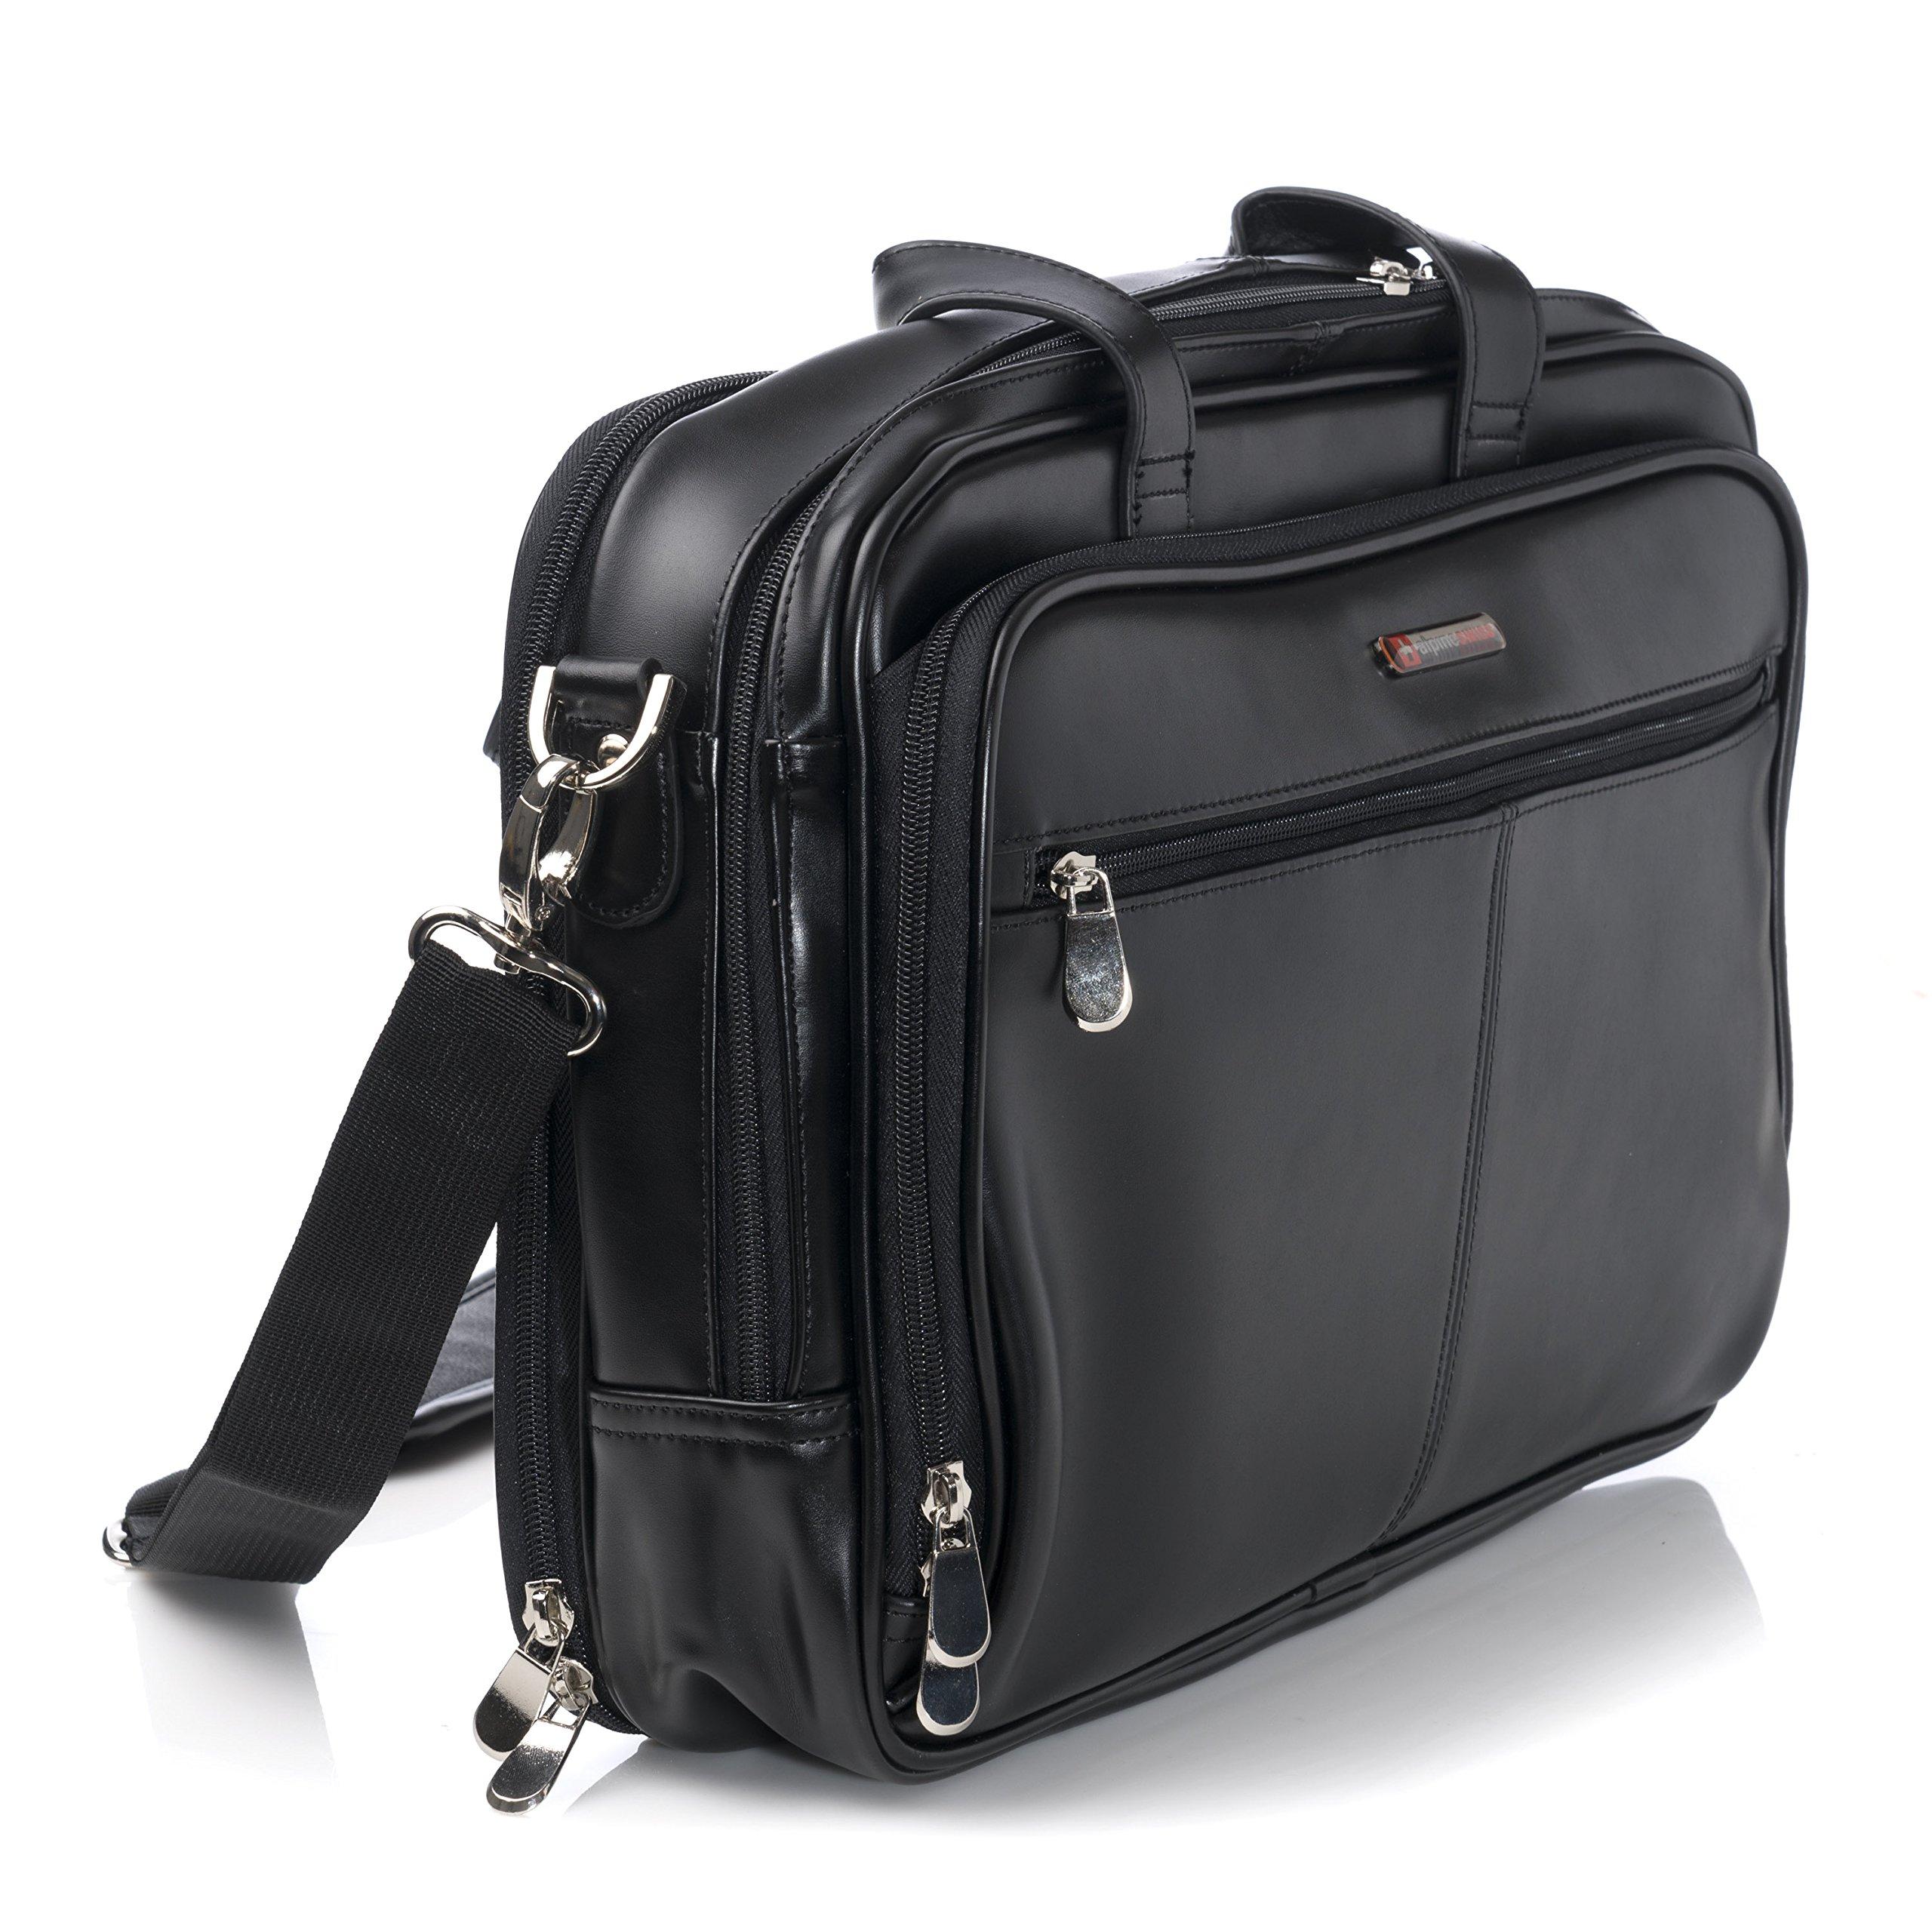 Alpine Swiss Monroe Leather Briefcase Top-Zip Laptop Messenger Bag Black by alpine swiss (Image #5)